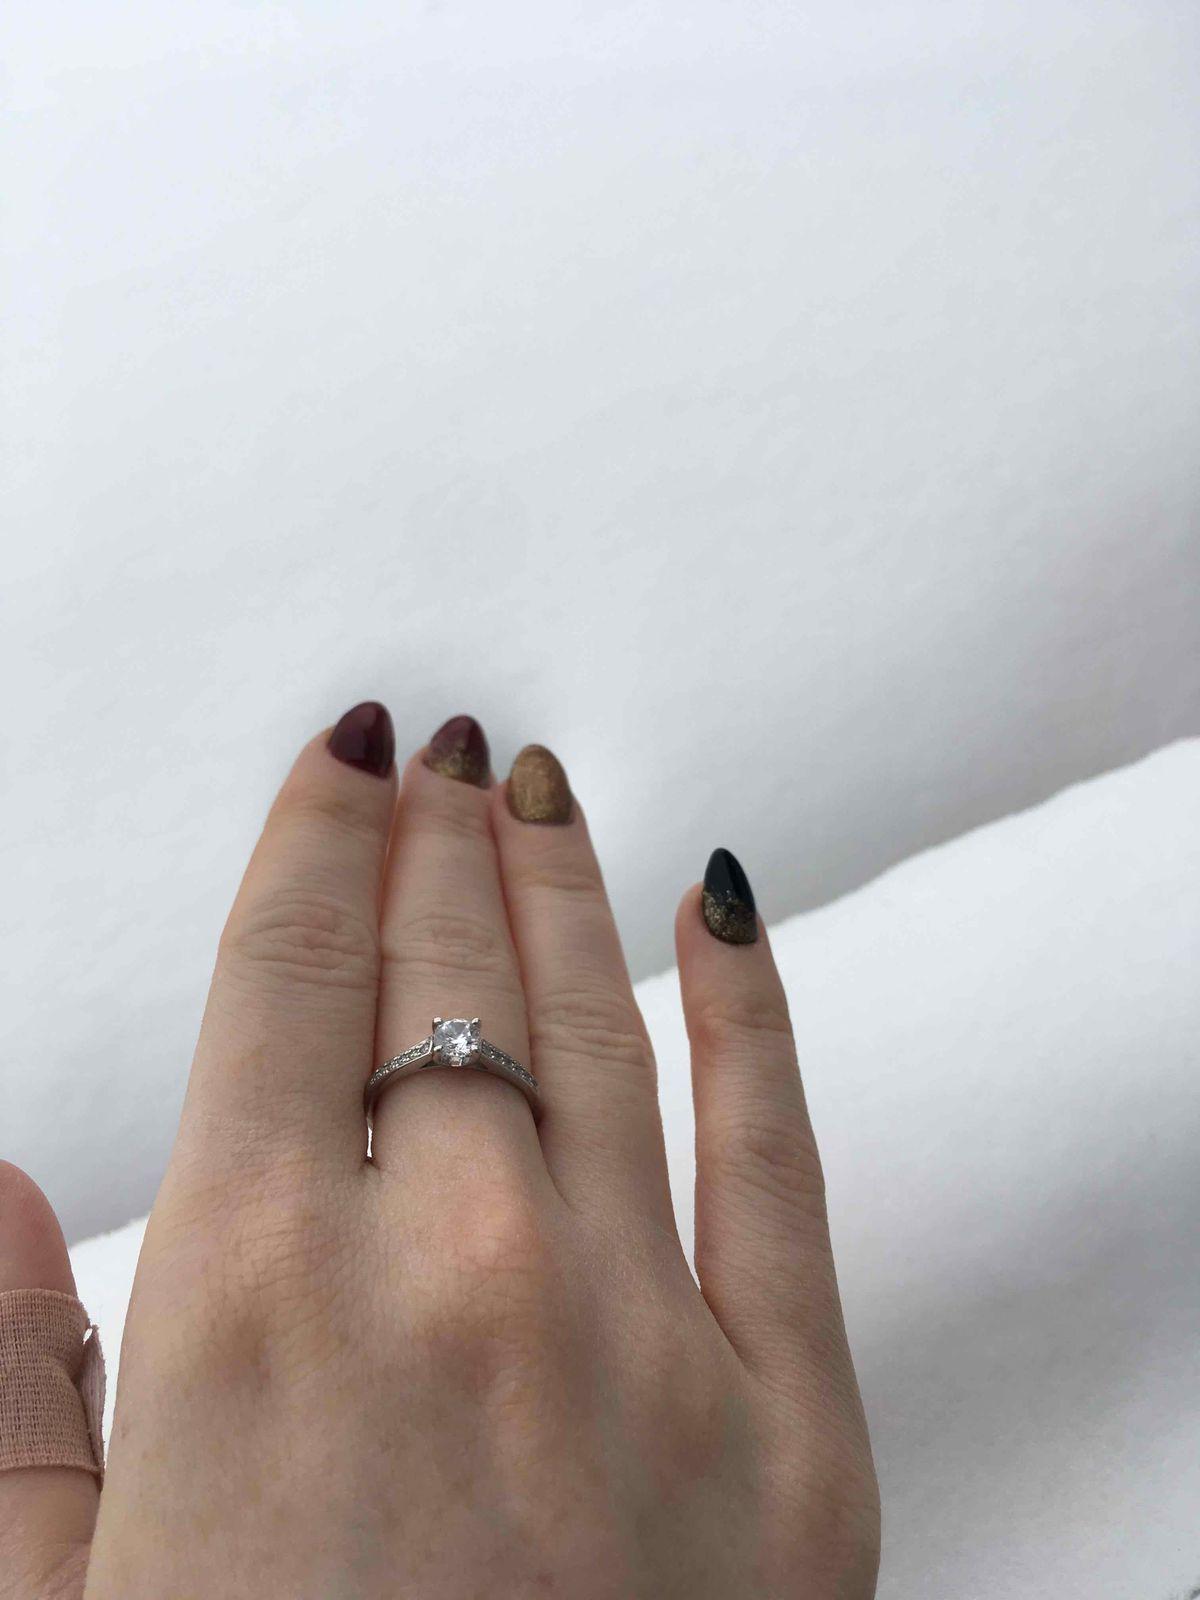 Кольцо с камнями 17.5 размер